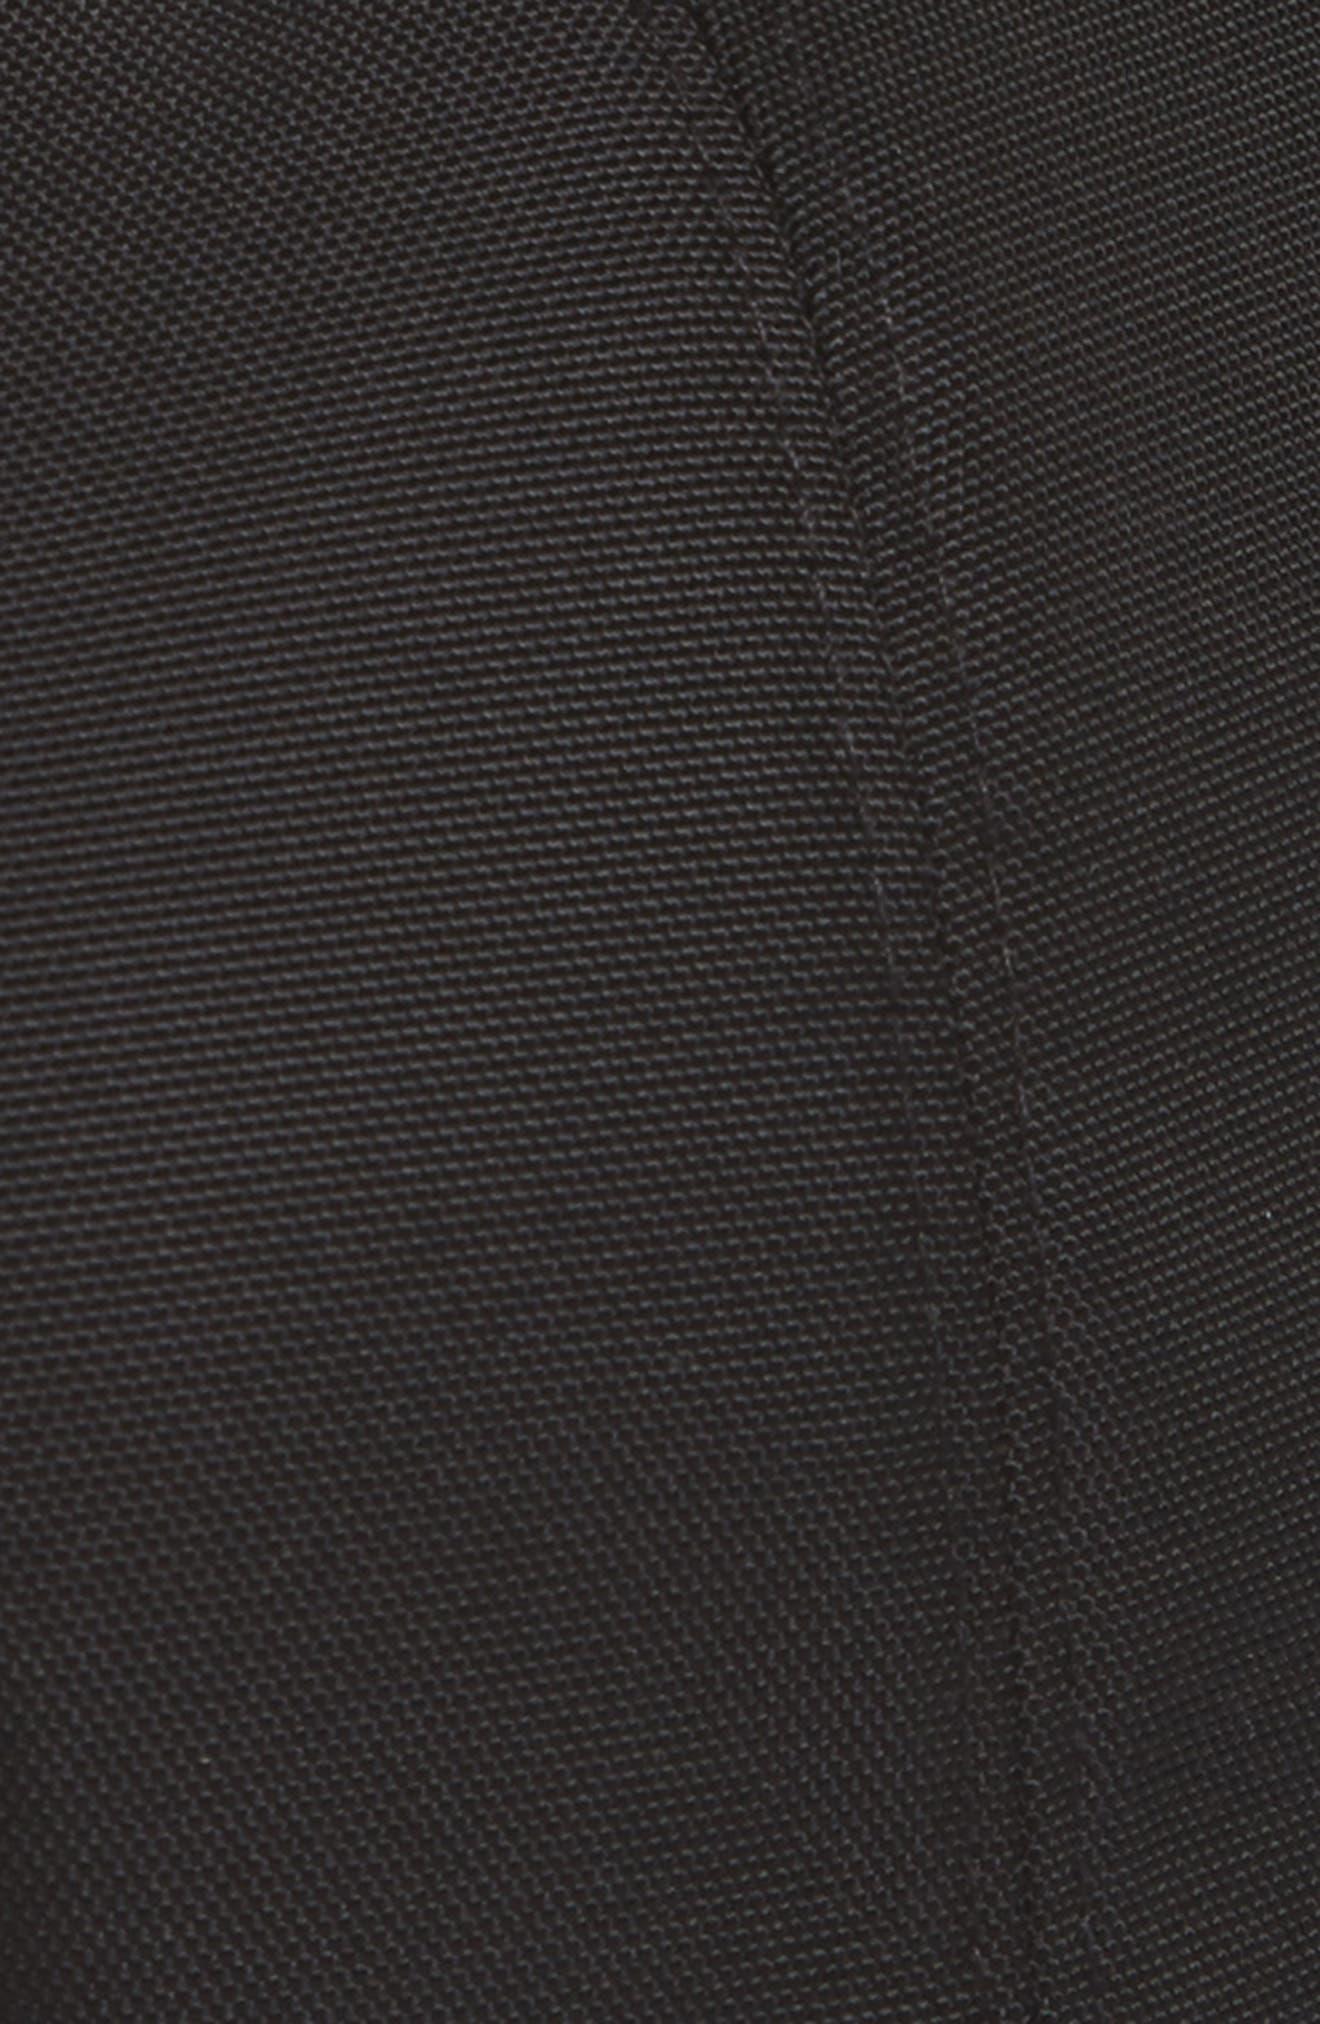 Embroidered Baseball Cap,                             Alternate thumbnail 3, color,                             Black Multi